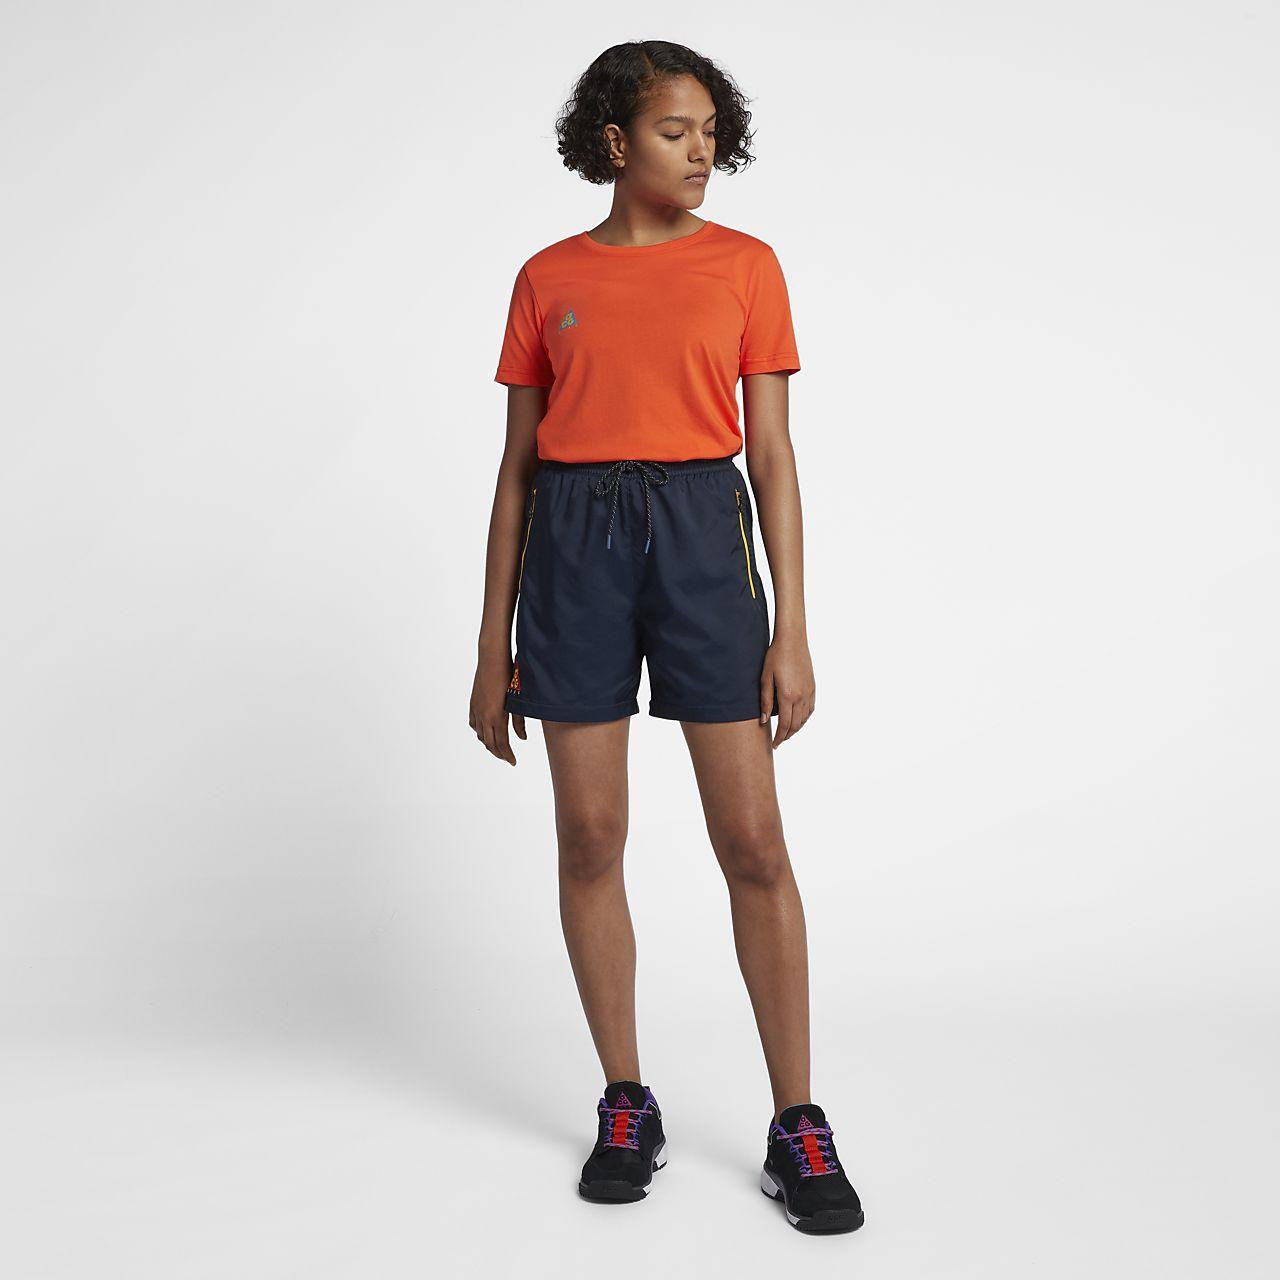 d9d2d4c62432 Nike ACG Women s T-Shirt. Nike.com